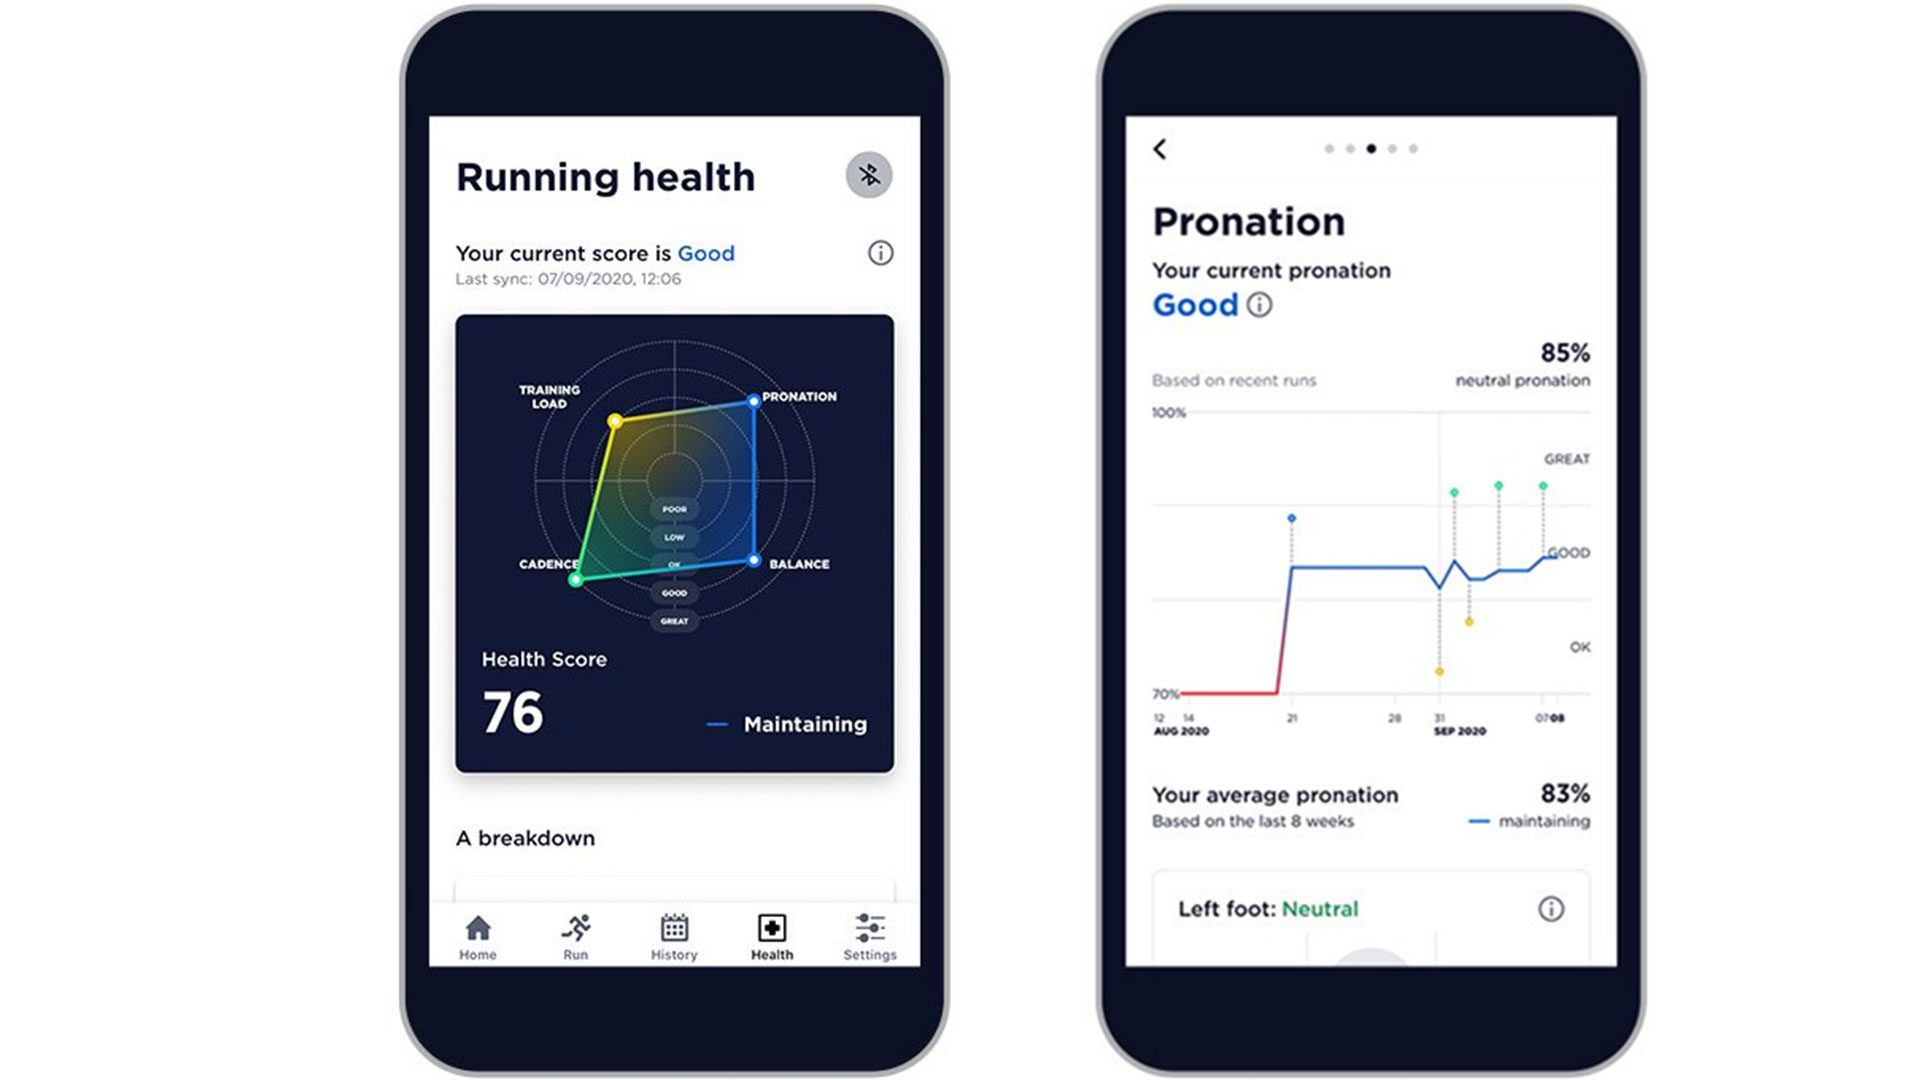 Running health and pronation